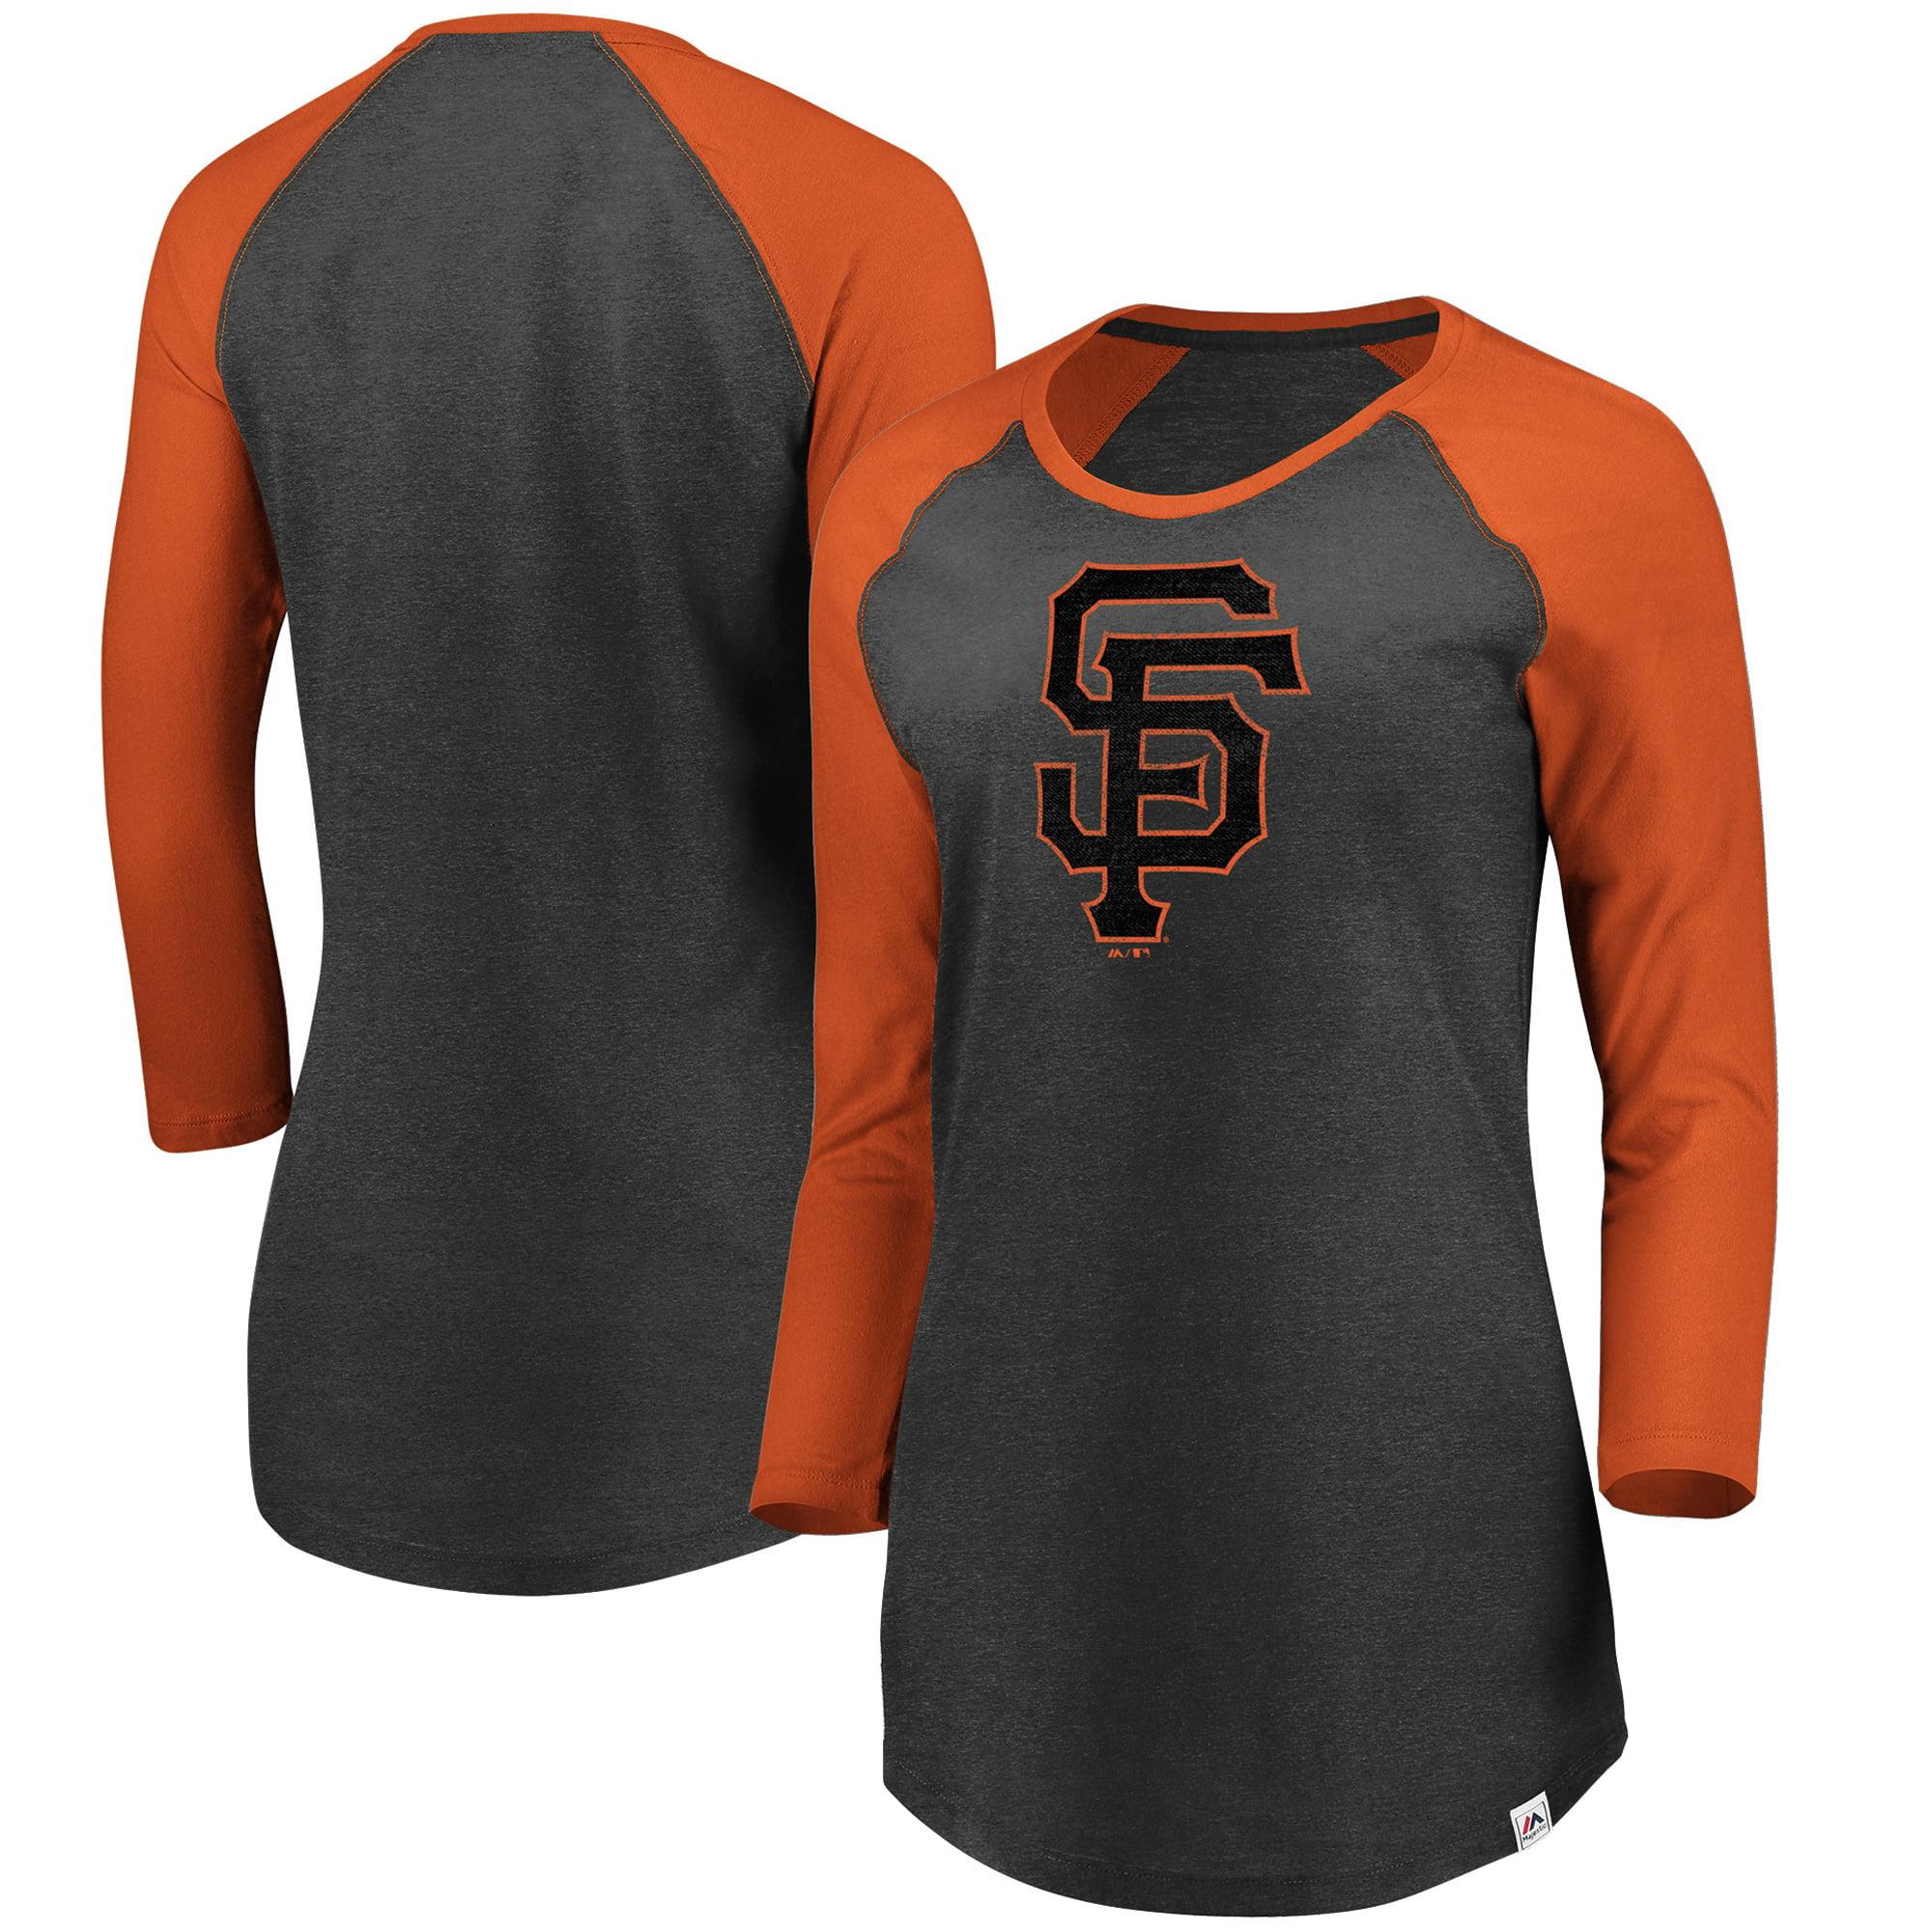 San Francisco Giants Majestic Women's Winner's Glory Raglan 3/4-Sleeve T-Shirt - Heathered Charcoal